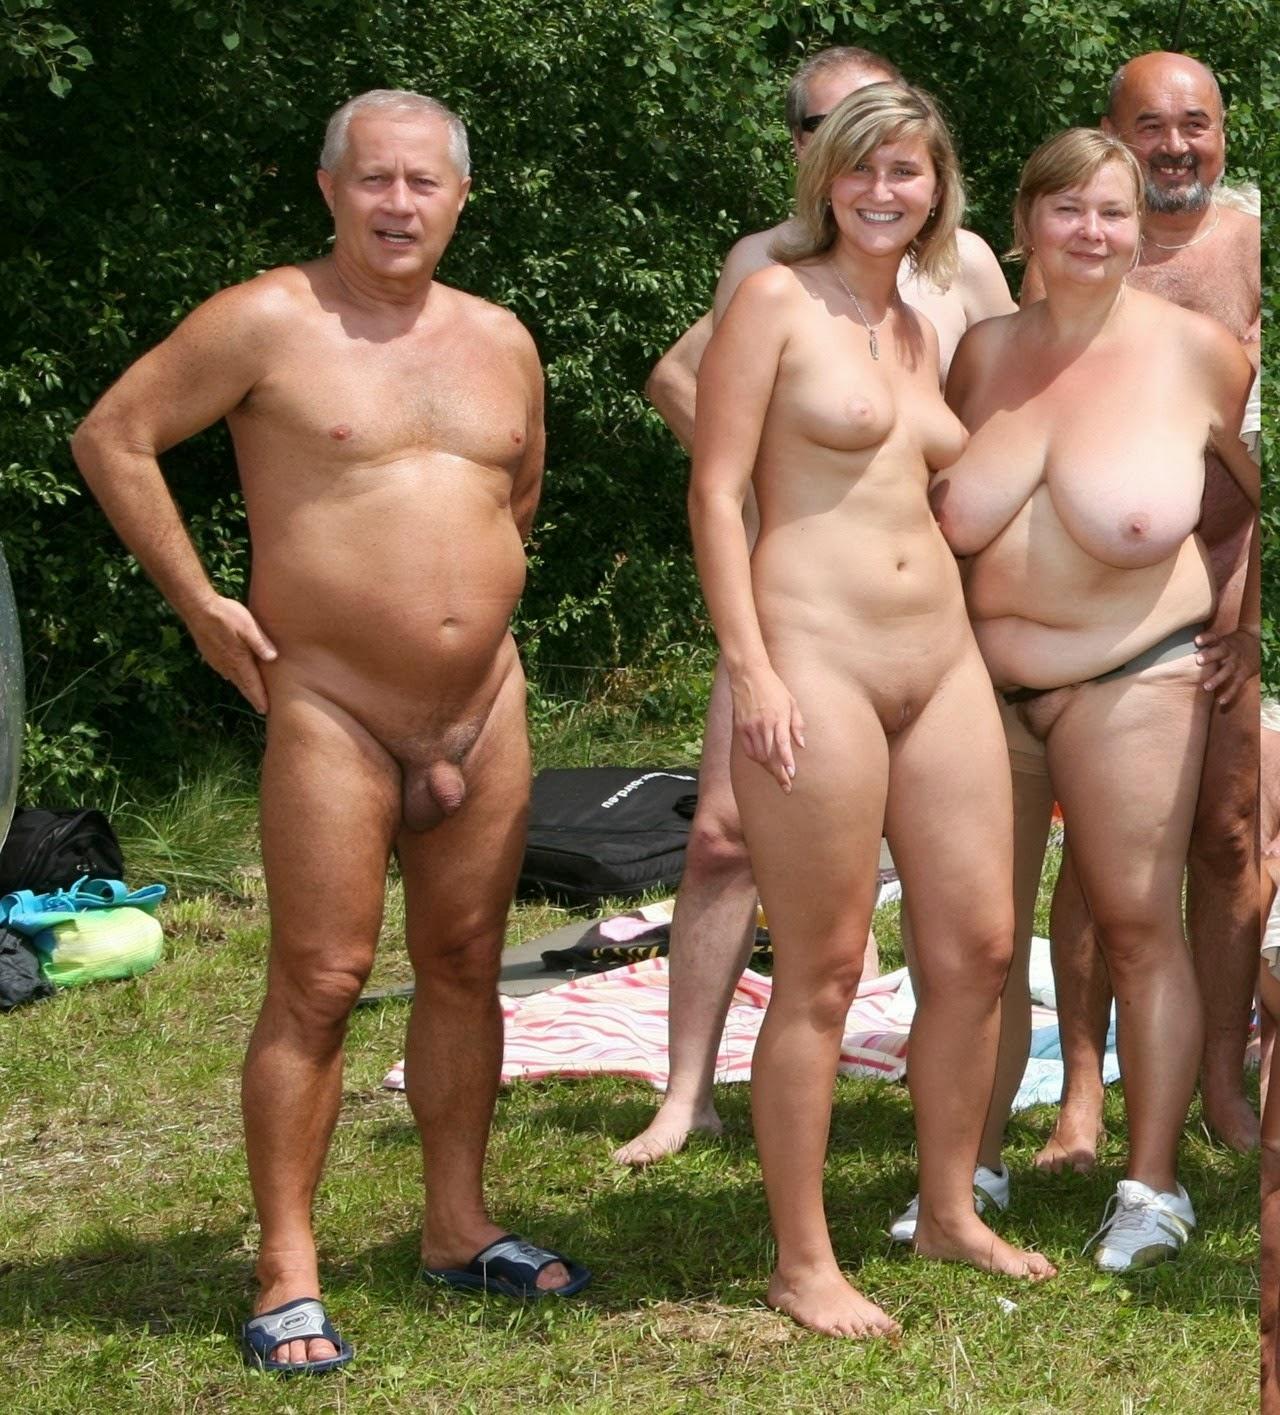 Free village nudity pics talented idea